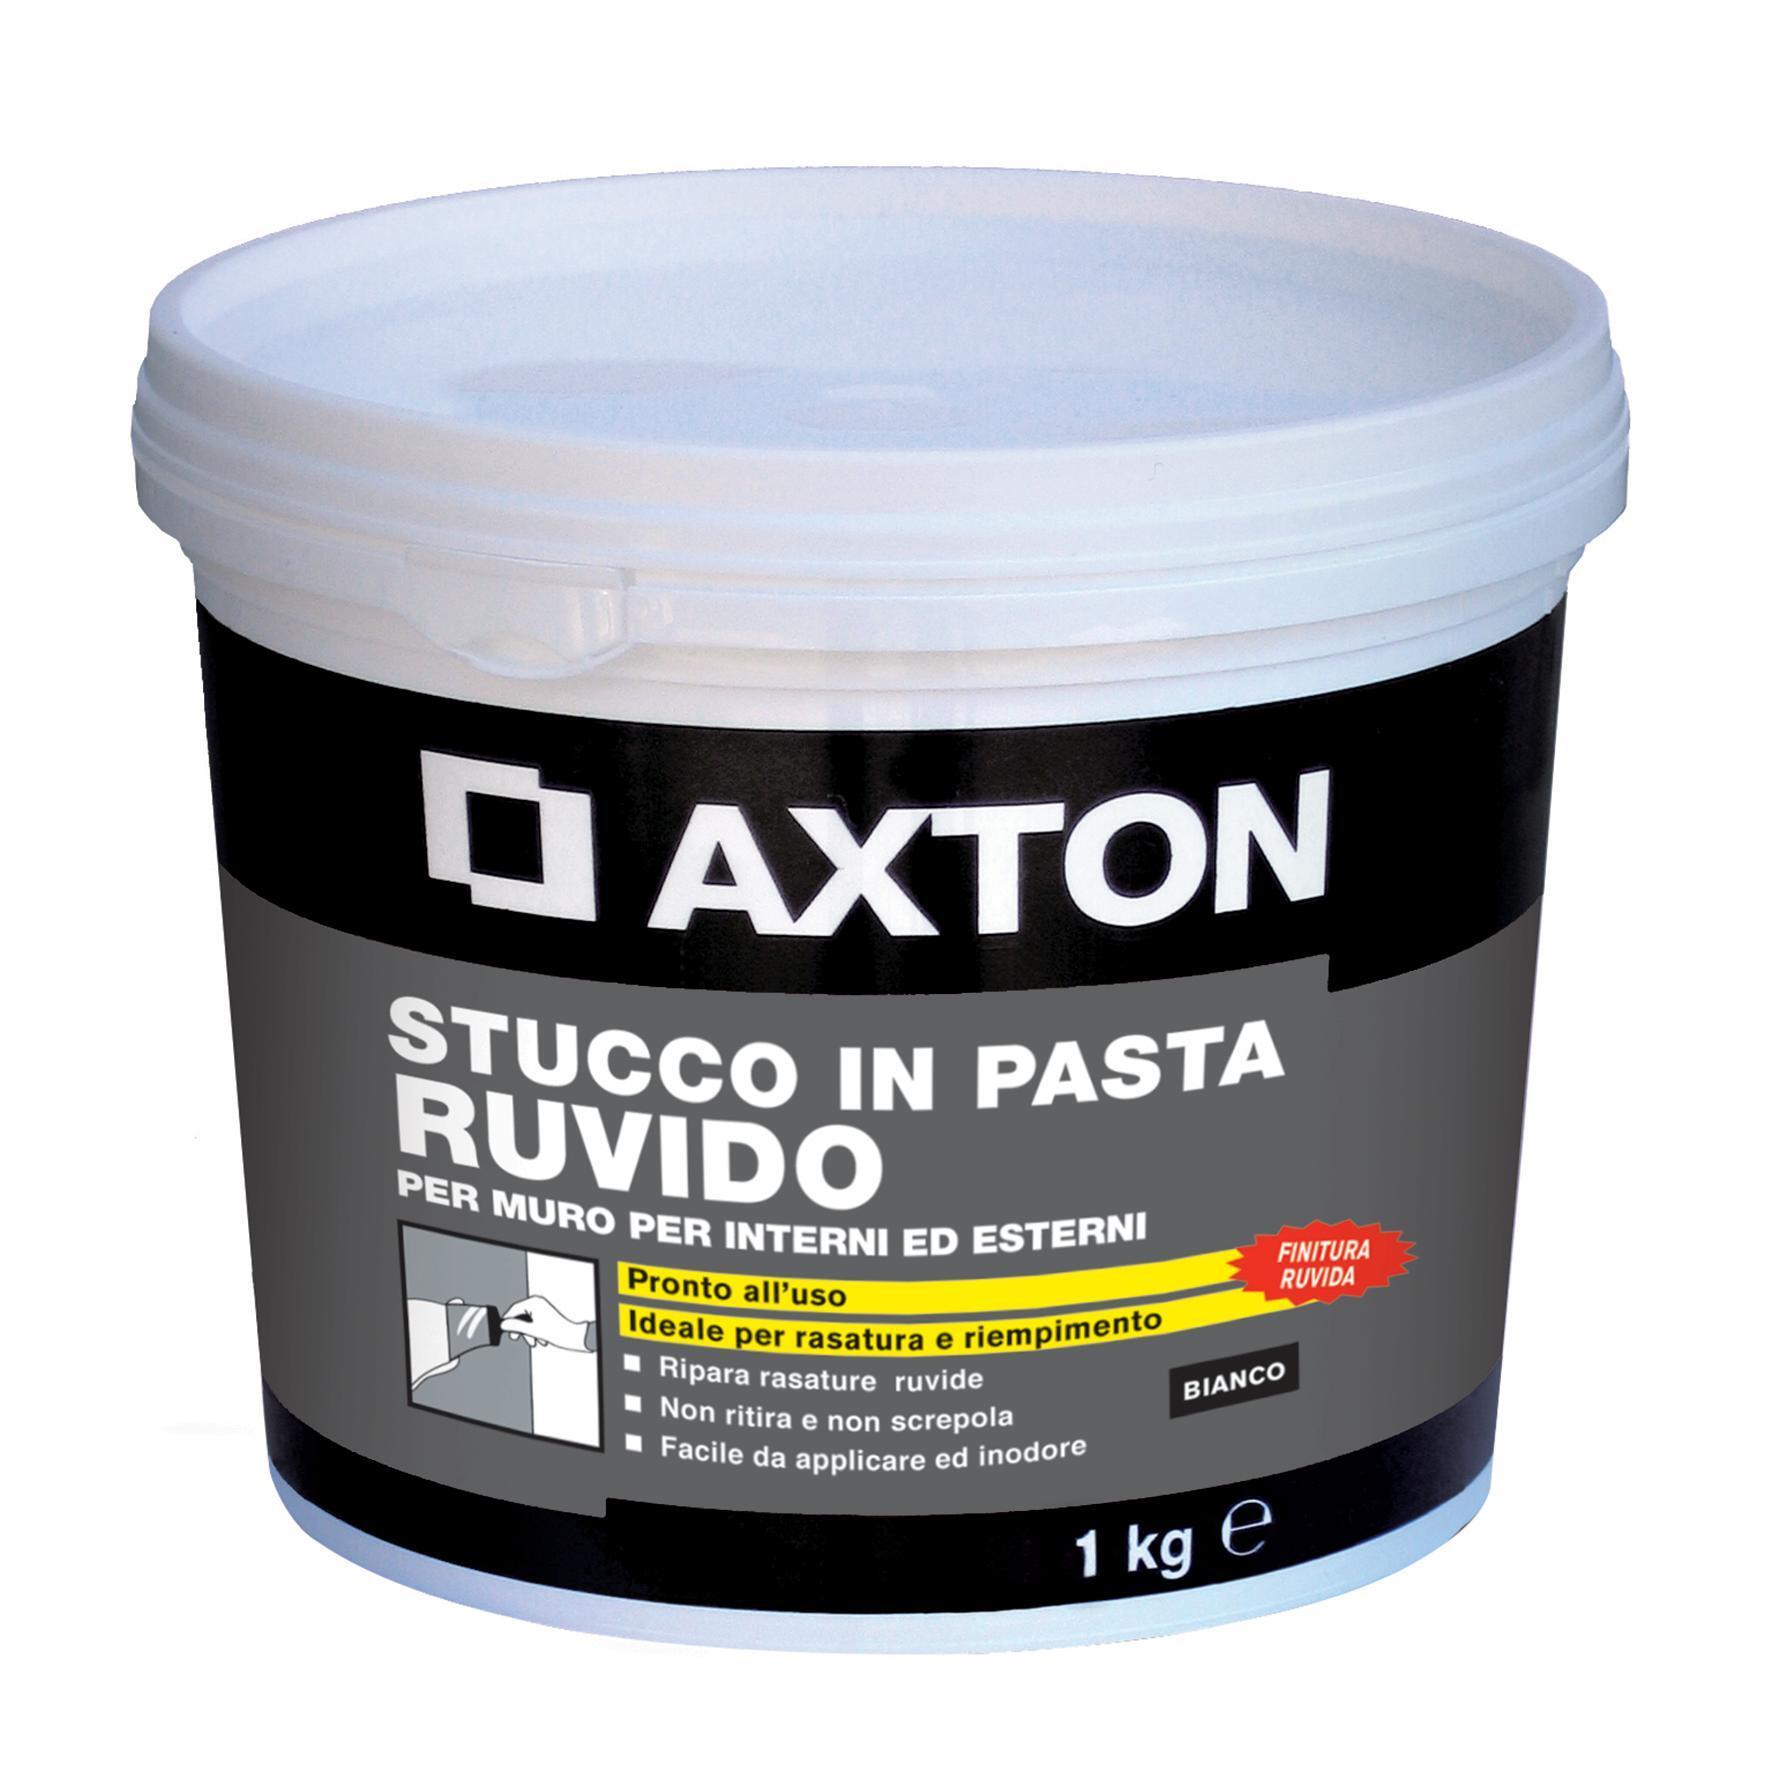 Stucco in pasta AXTON 1 kg bianco